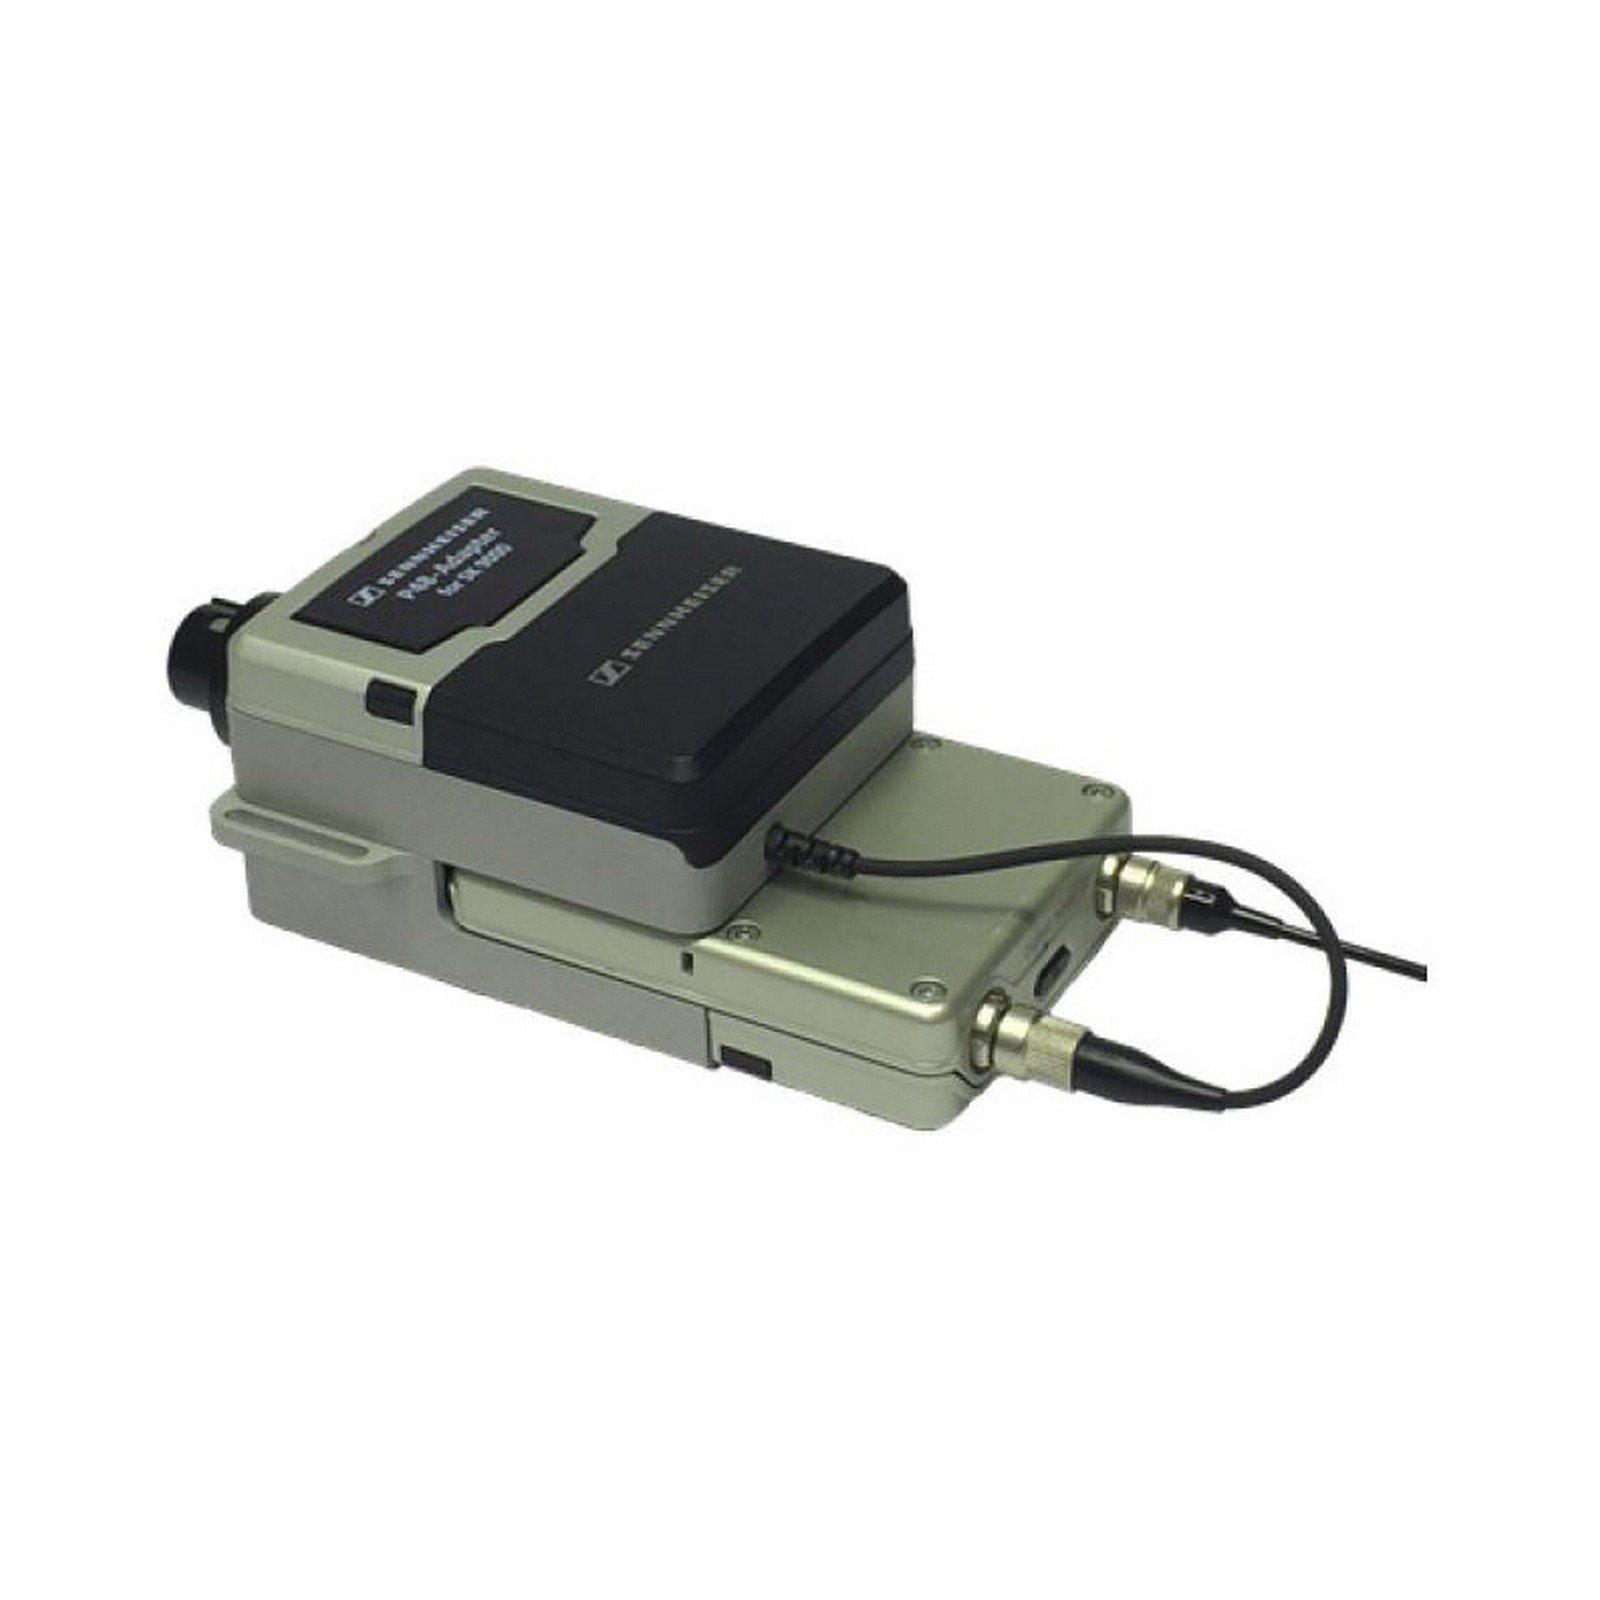 Sennheiser P48 ADAPTER SK 9000, 48V Phantom Power Adaptor